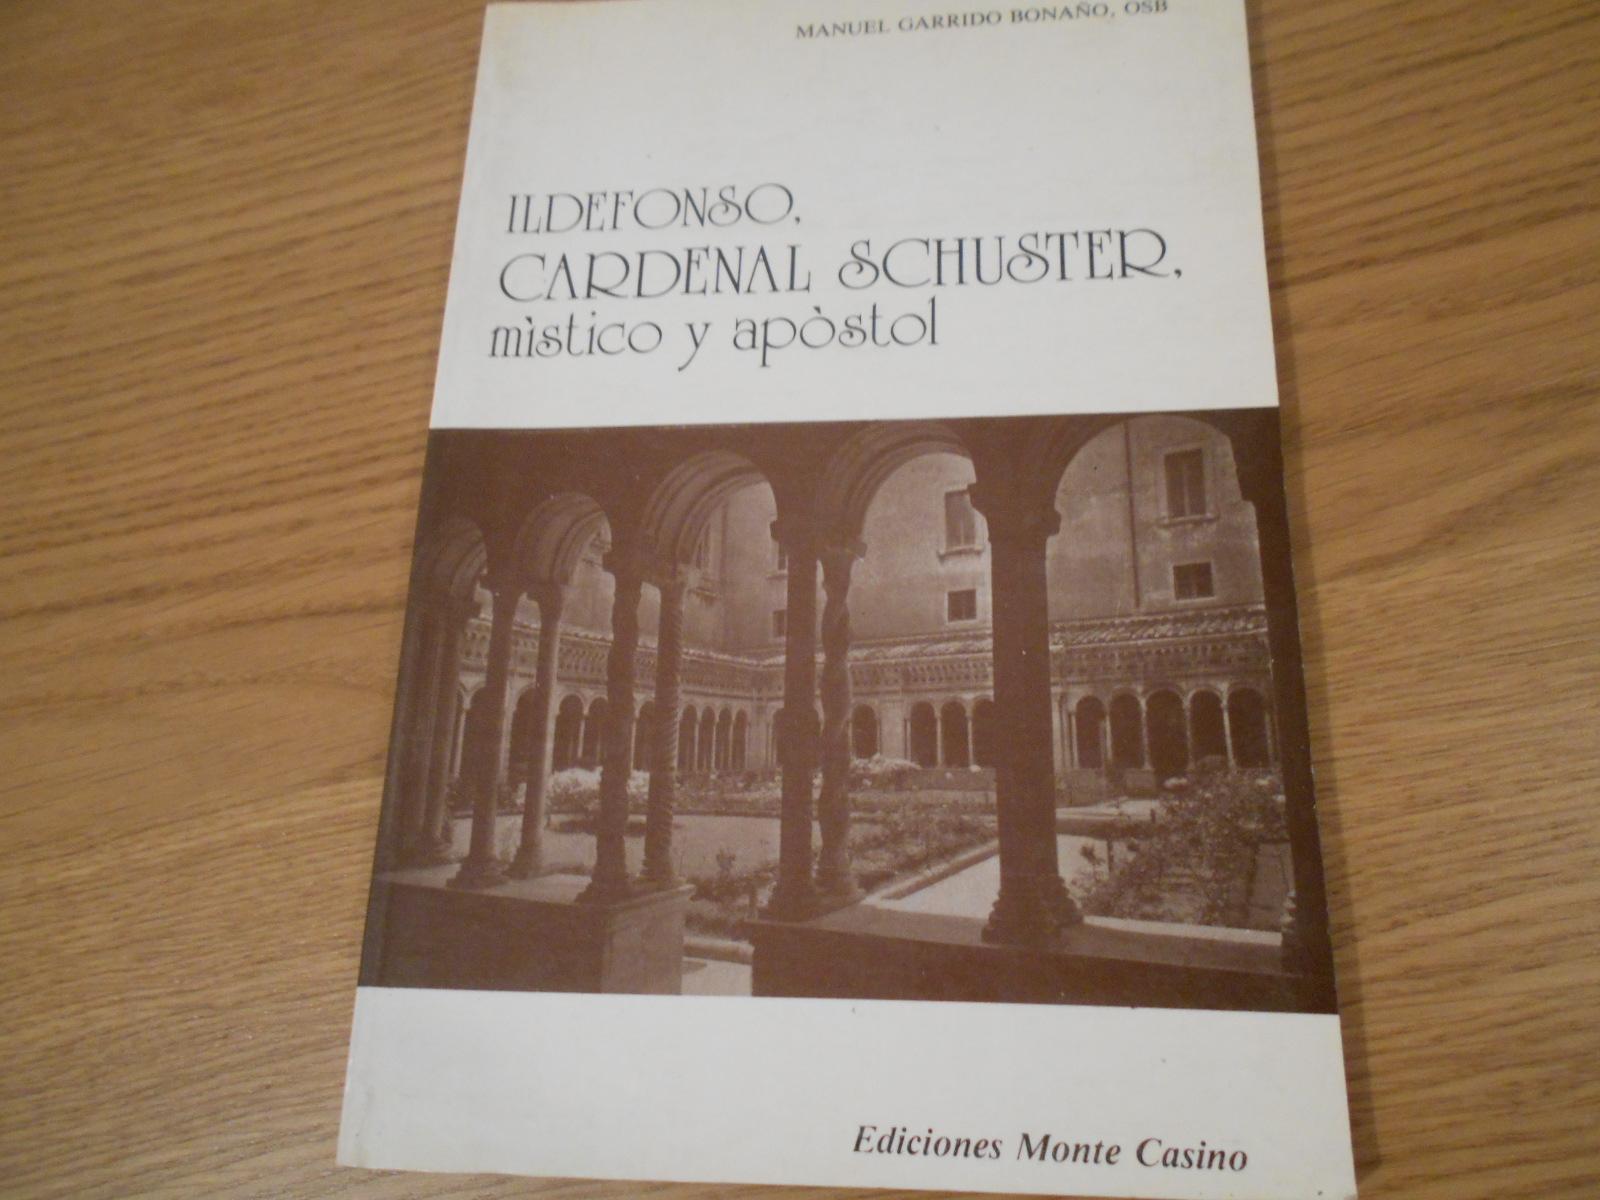 Ildefonso, Cardenal Schuster, místico y apóstol. - Garrido Bonaño, Manuel